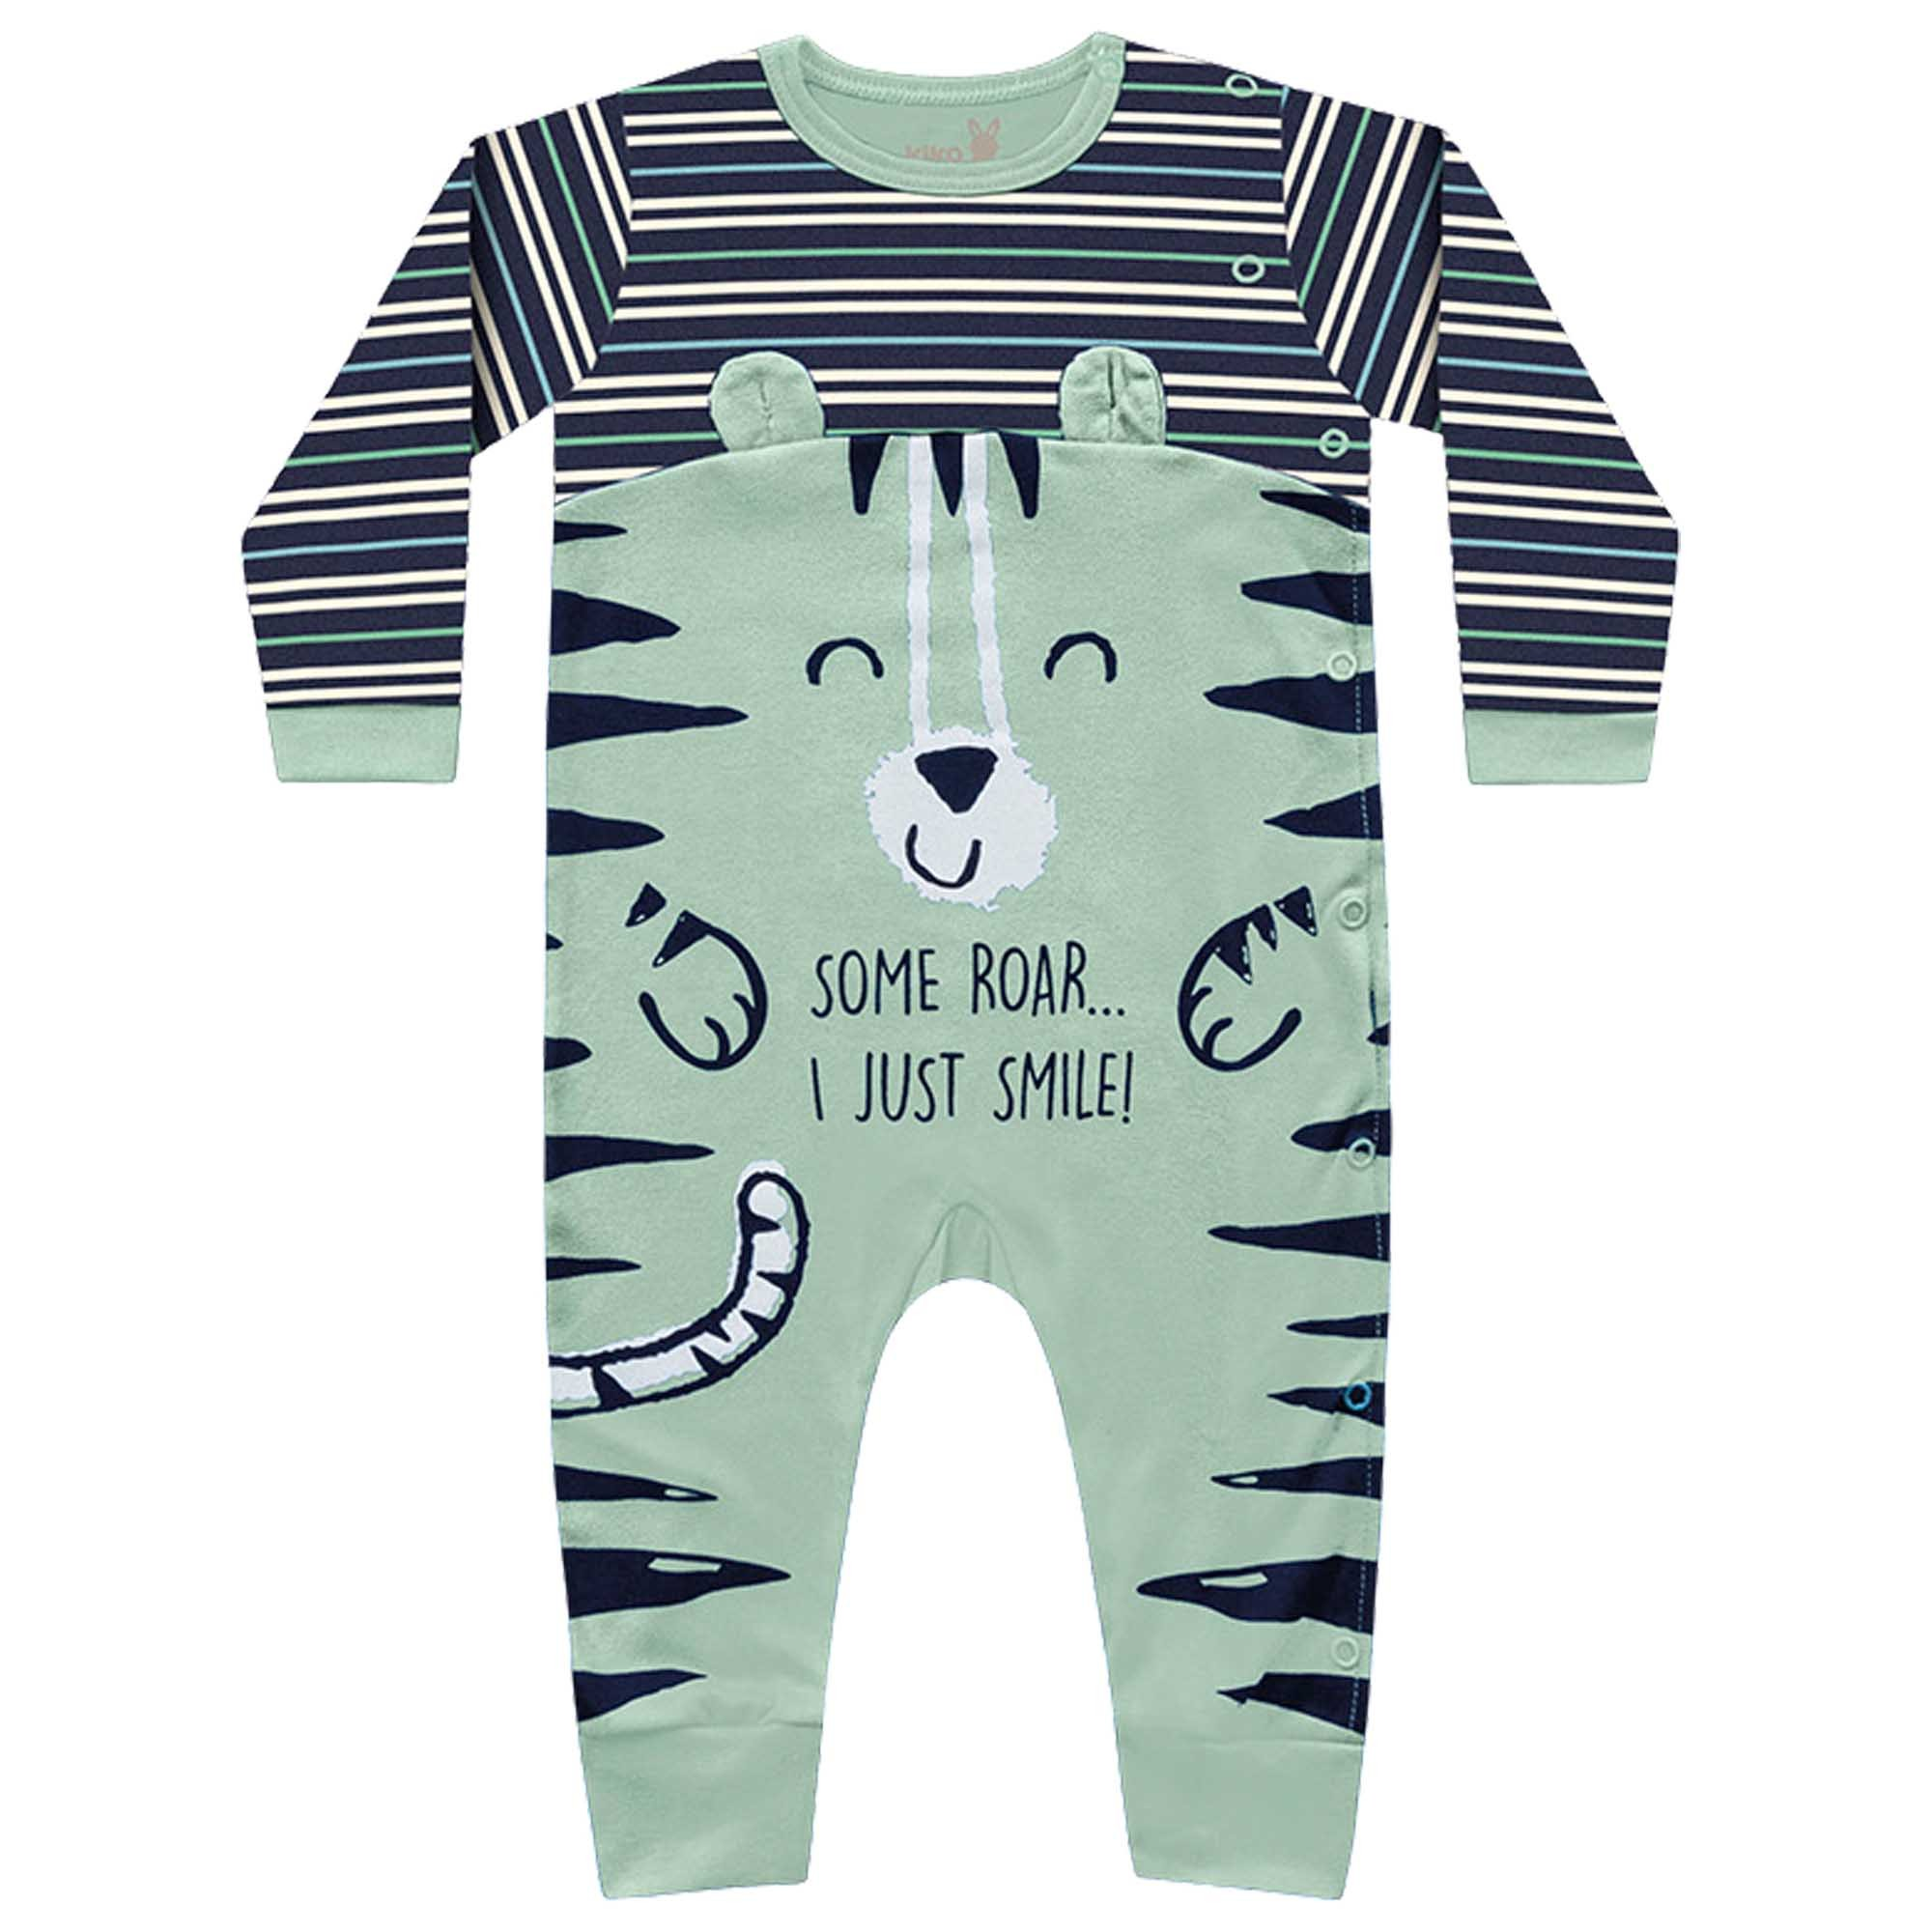 Macacão Inverno Kiko Baby - Tigre - RN ao G